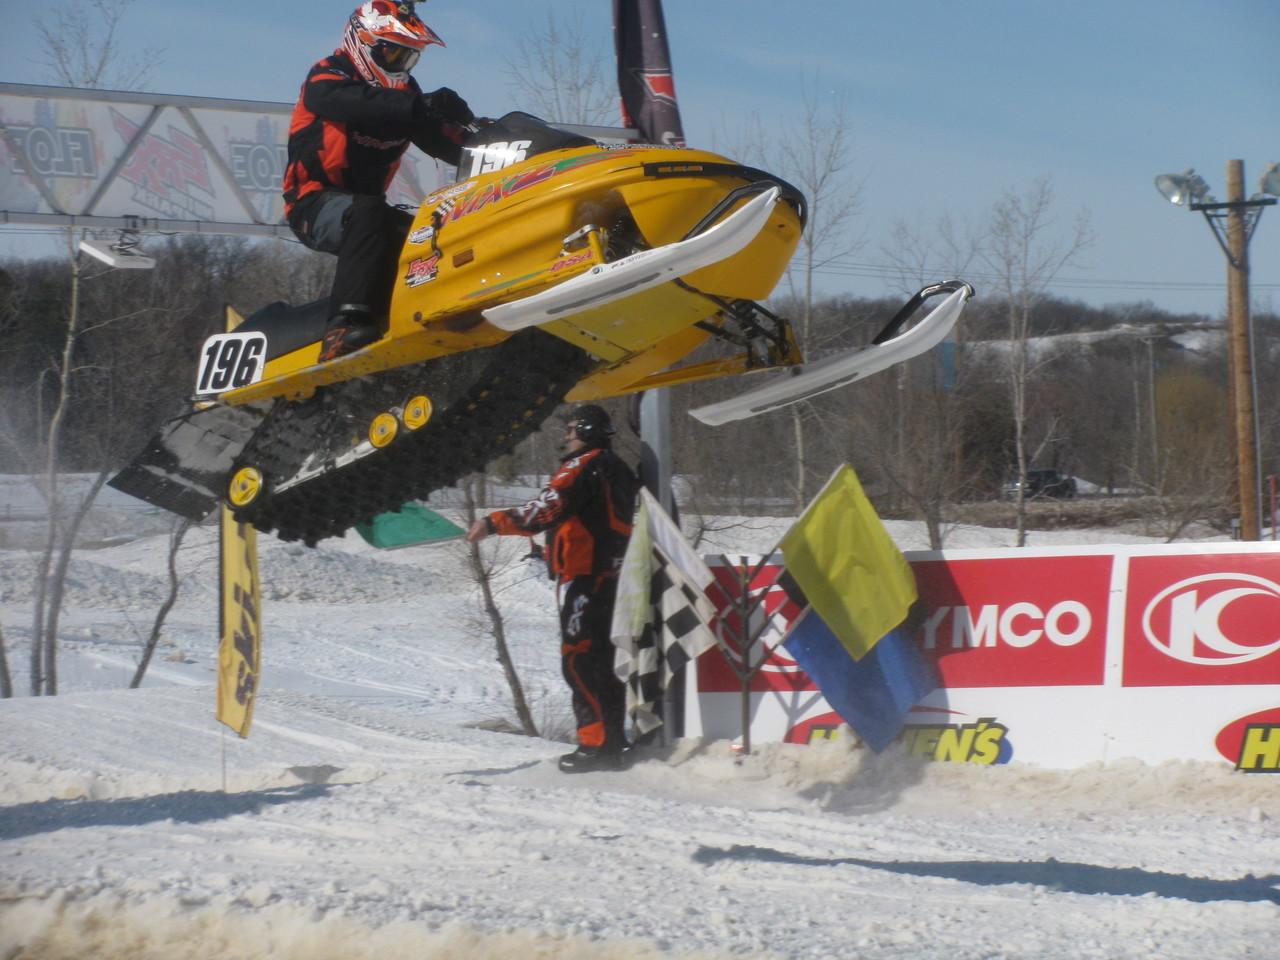 Ray Osowski getting nice air on the Plasti-Sleeve sponsored #196 Ski-Doo.